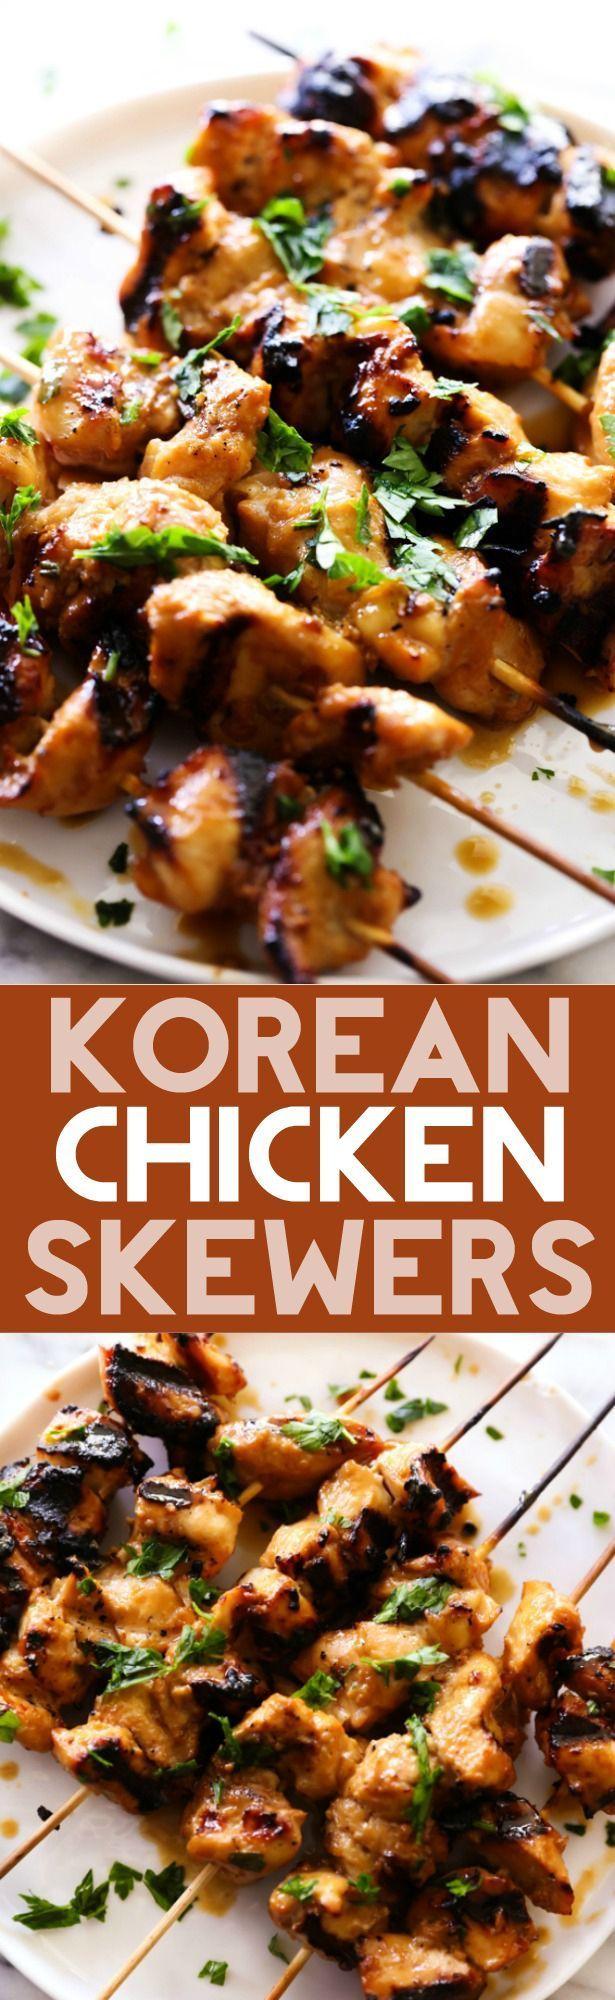 Korean Chicken Skewers recipe from @Chef in Training